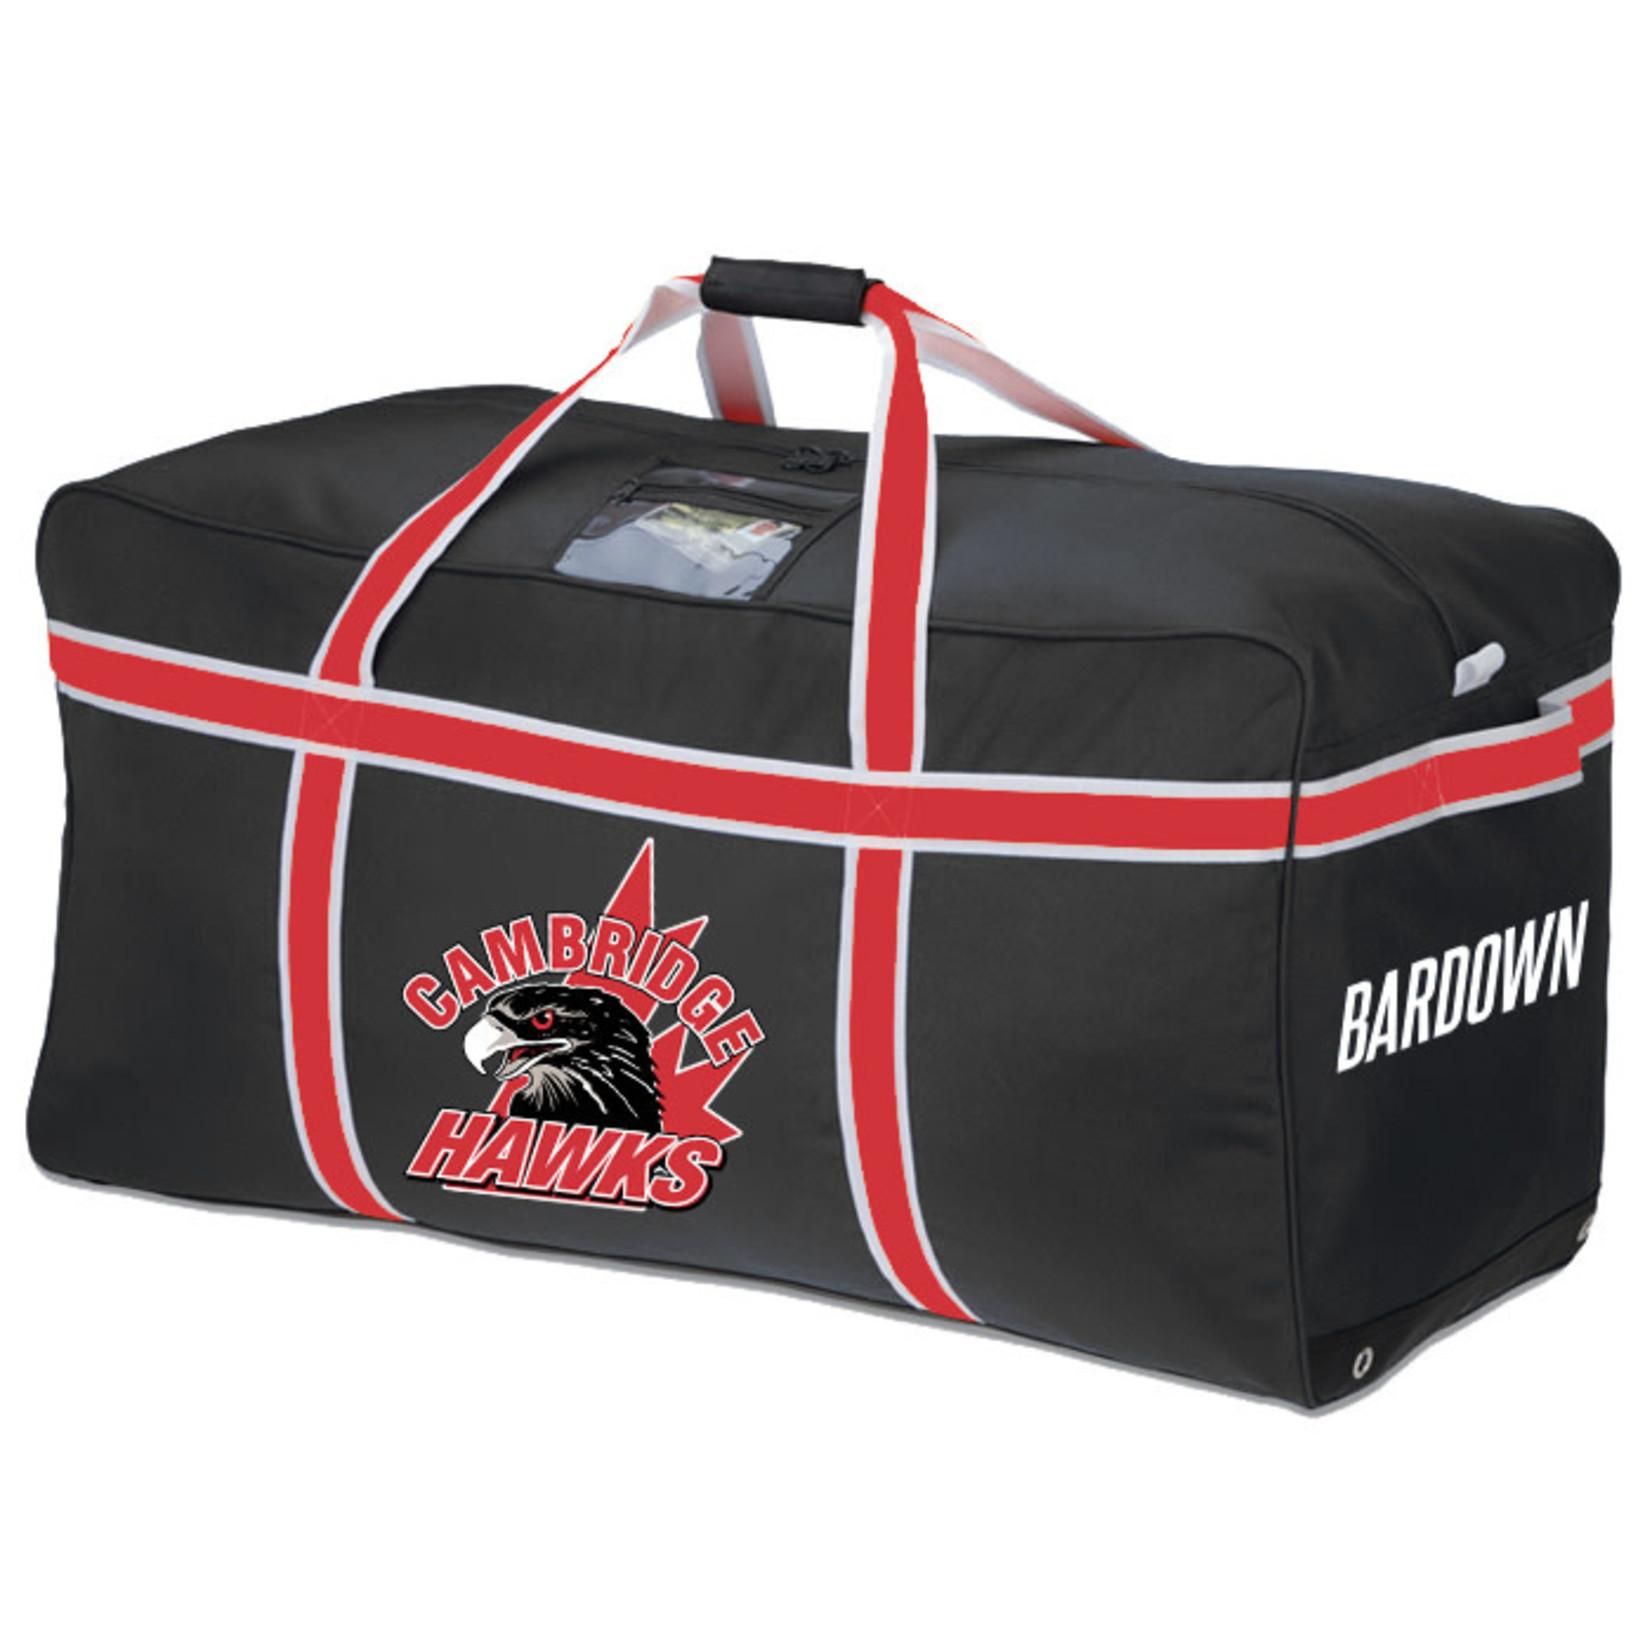 Bardown Hawks SR Bag - PRE ORDER